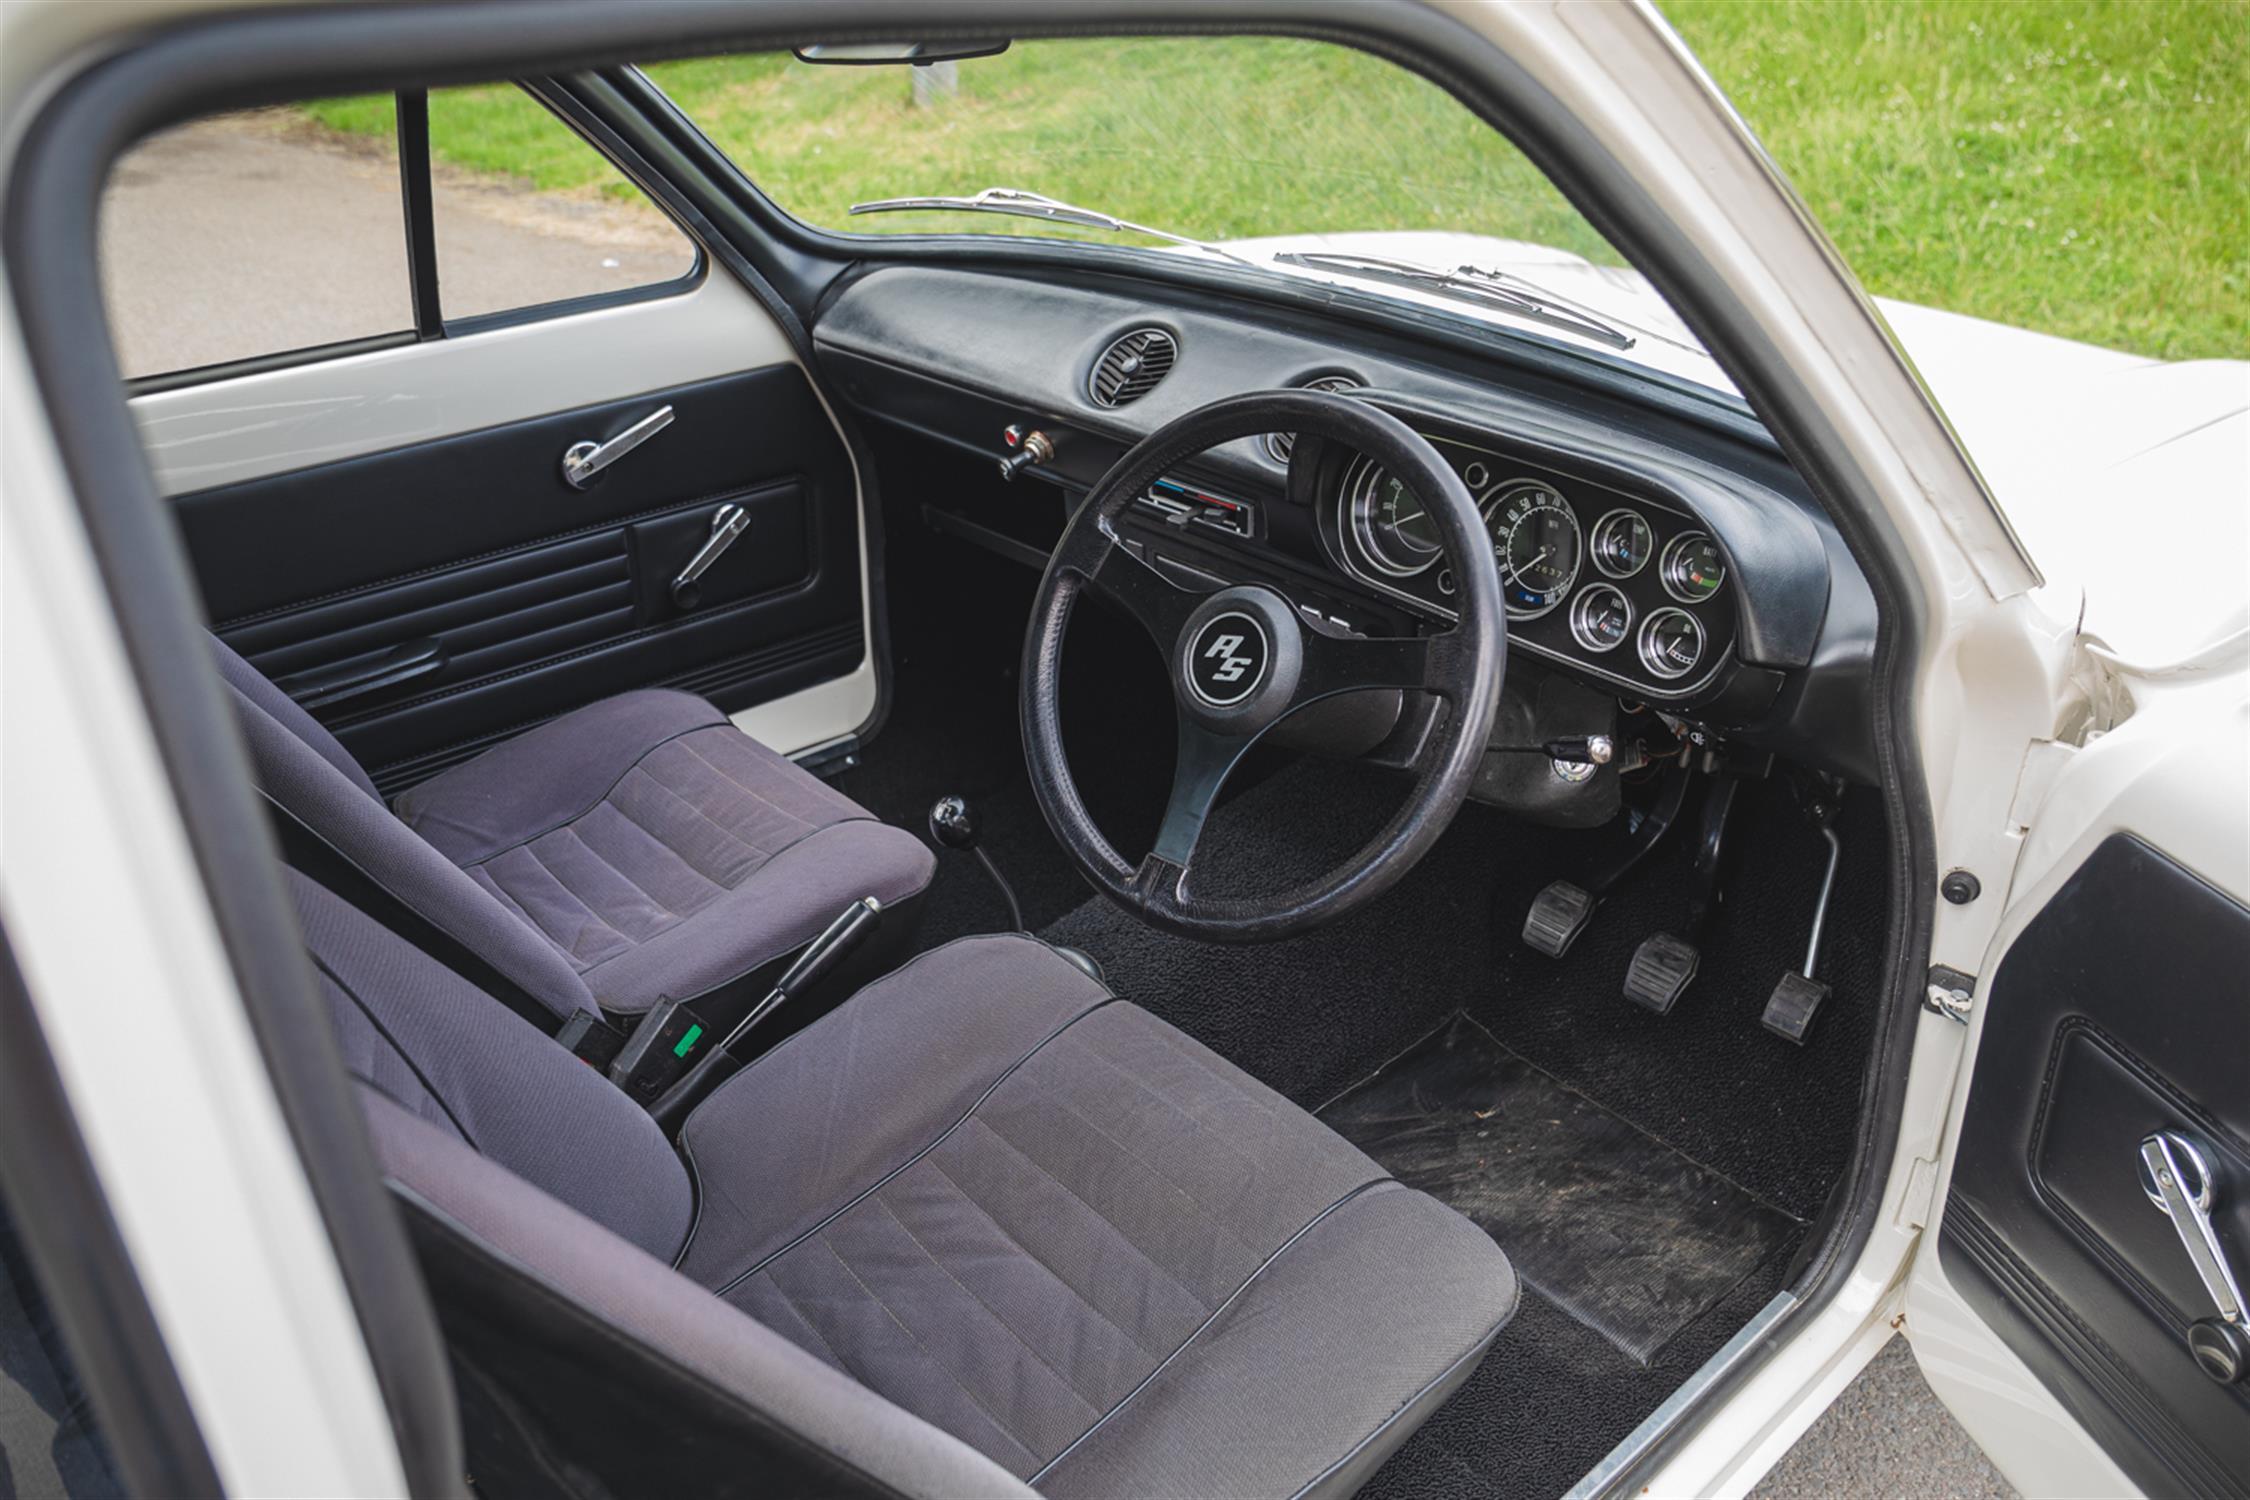 1972 Ford Escort RS1600 BDA - Image 3 of 10